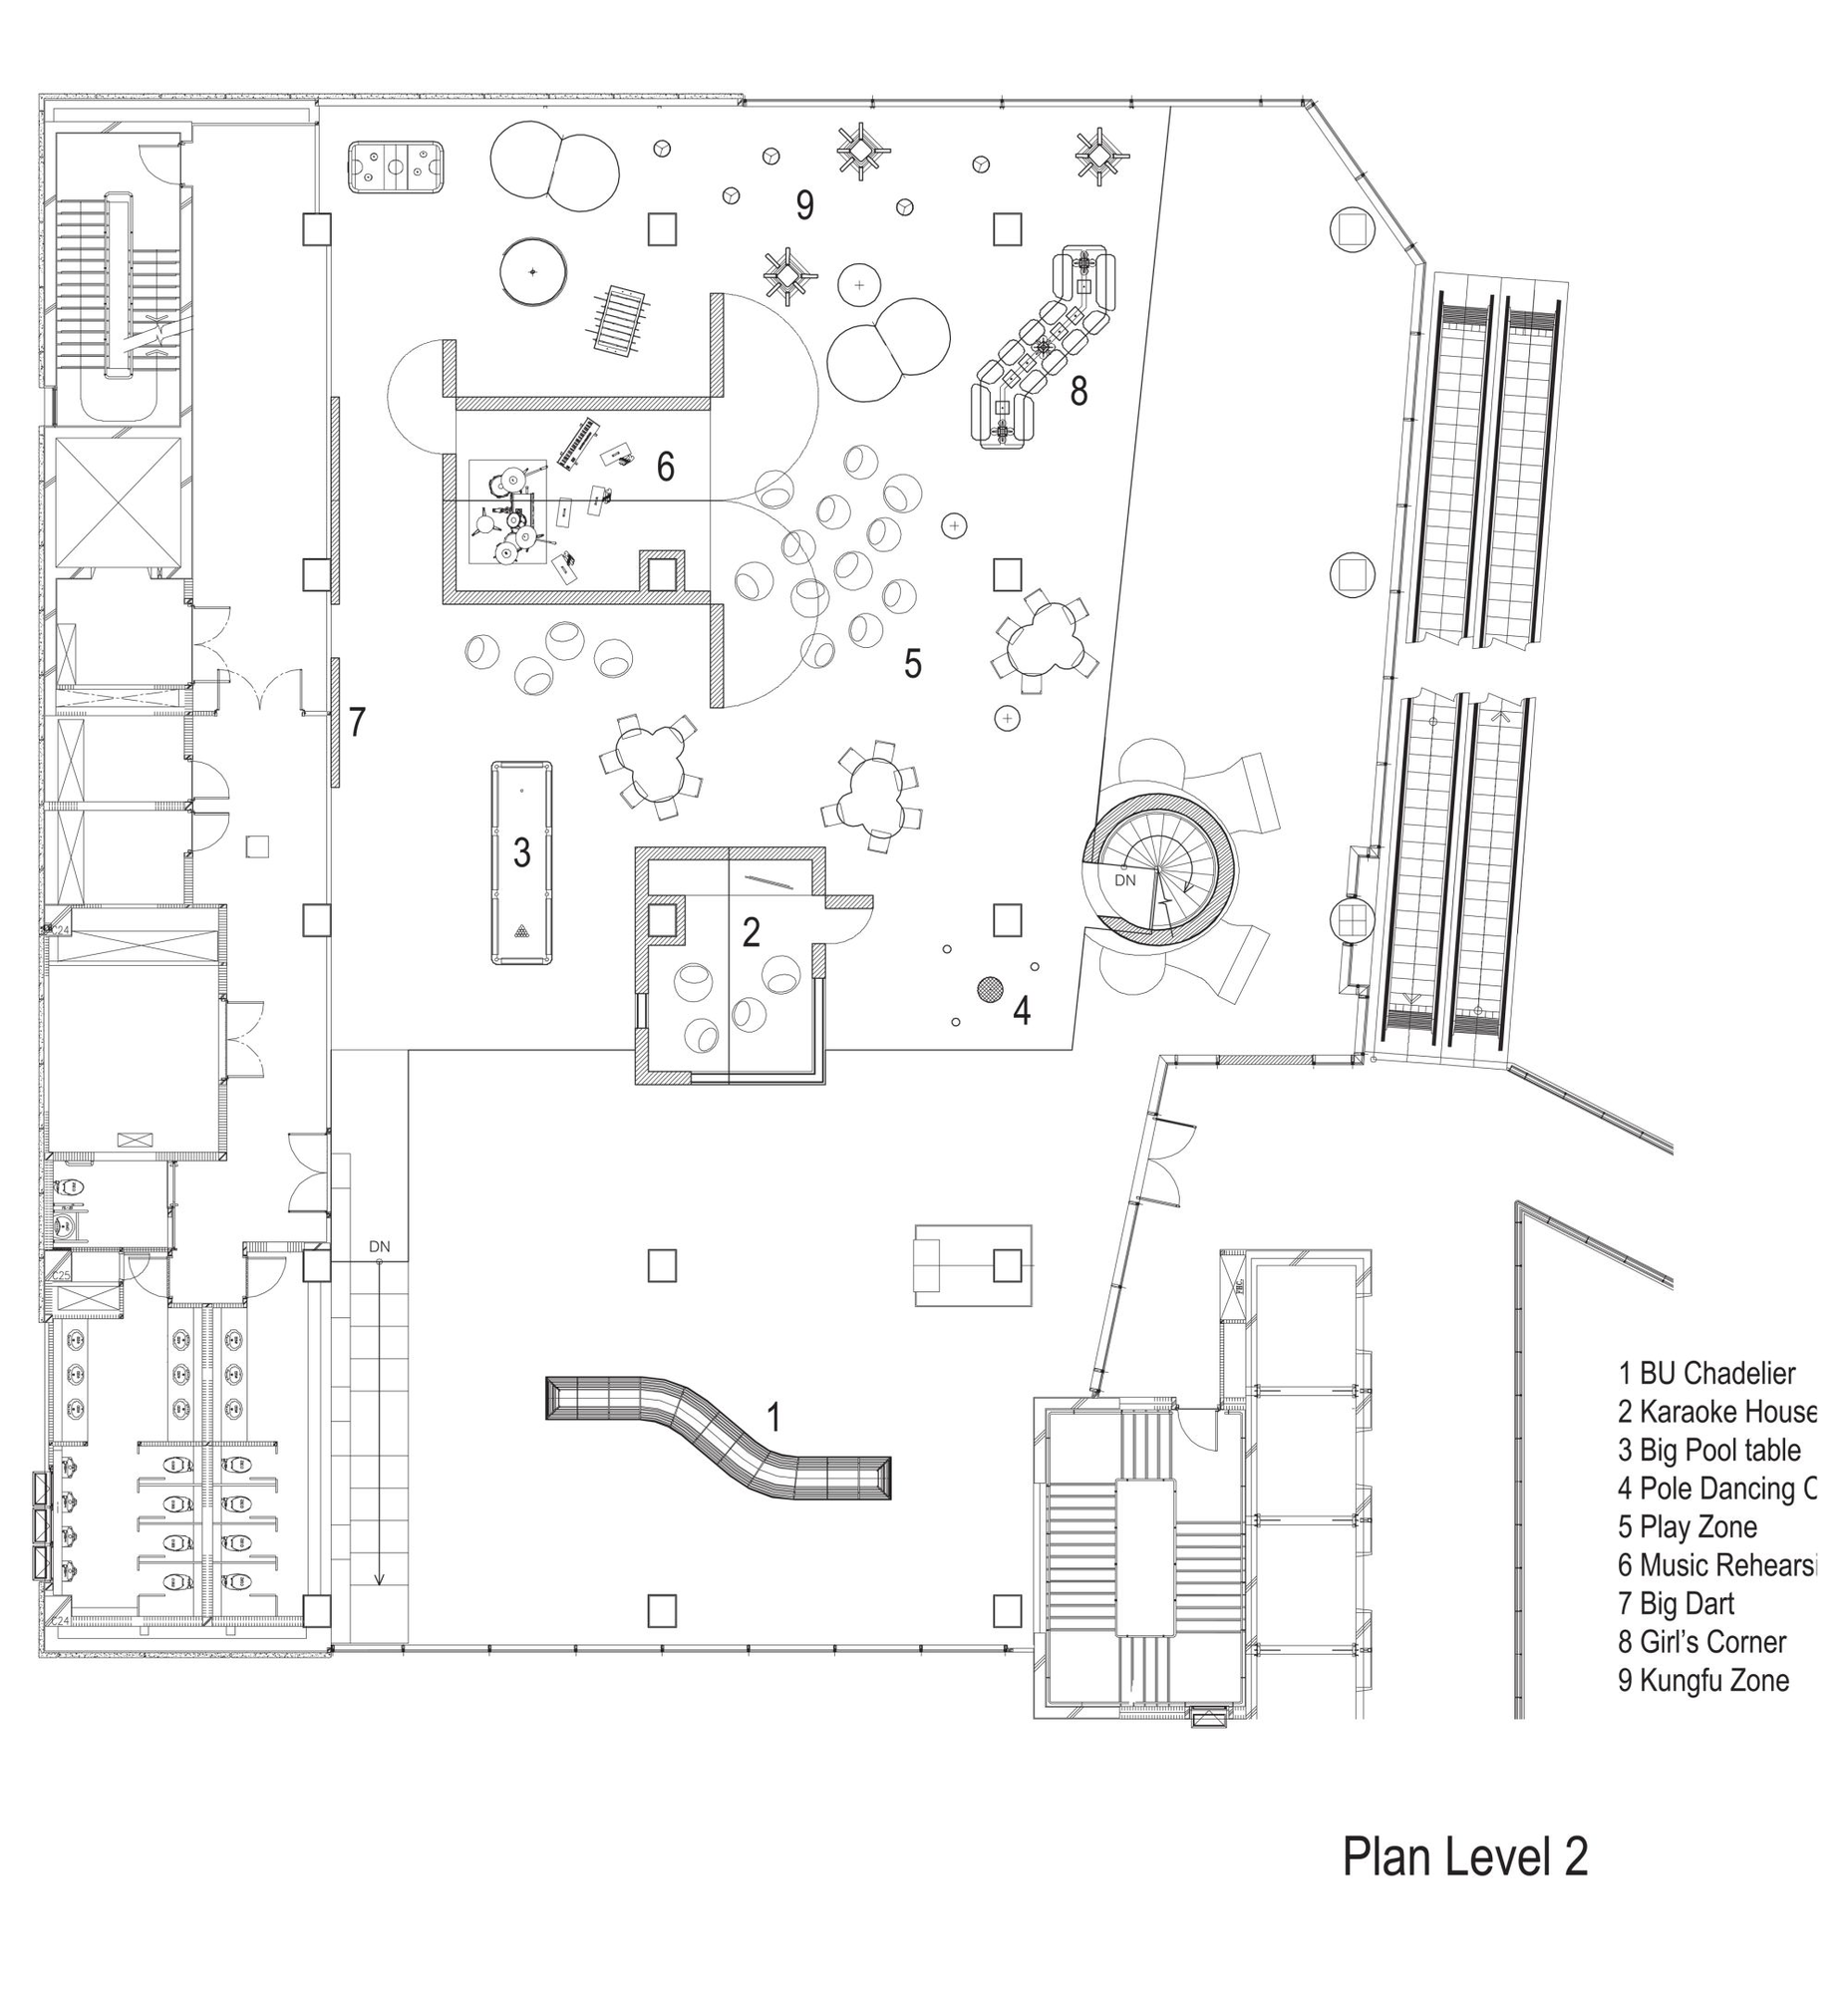 Hotel Lounge Floor Plan